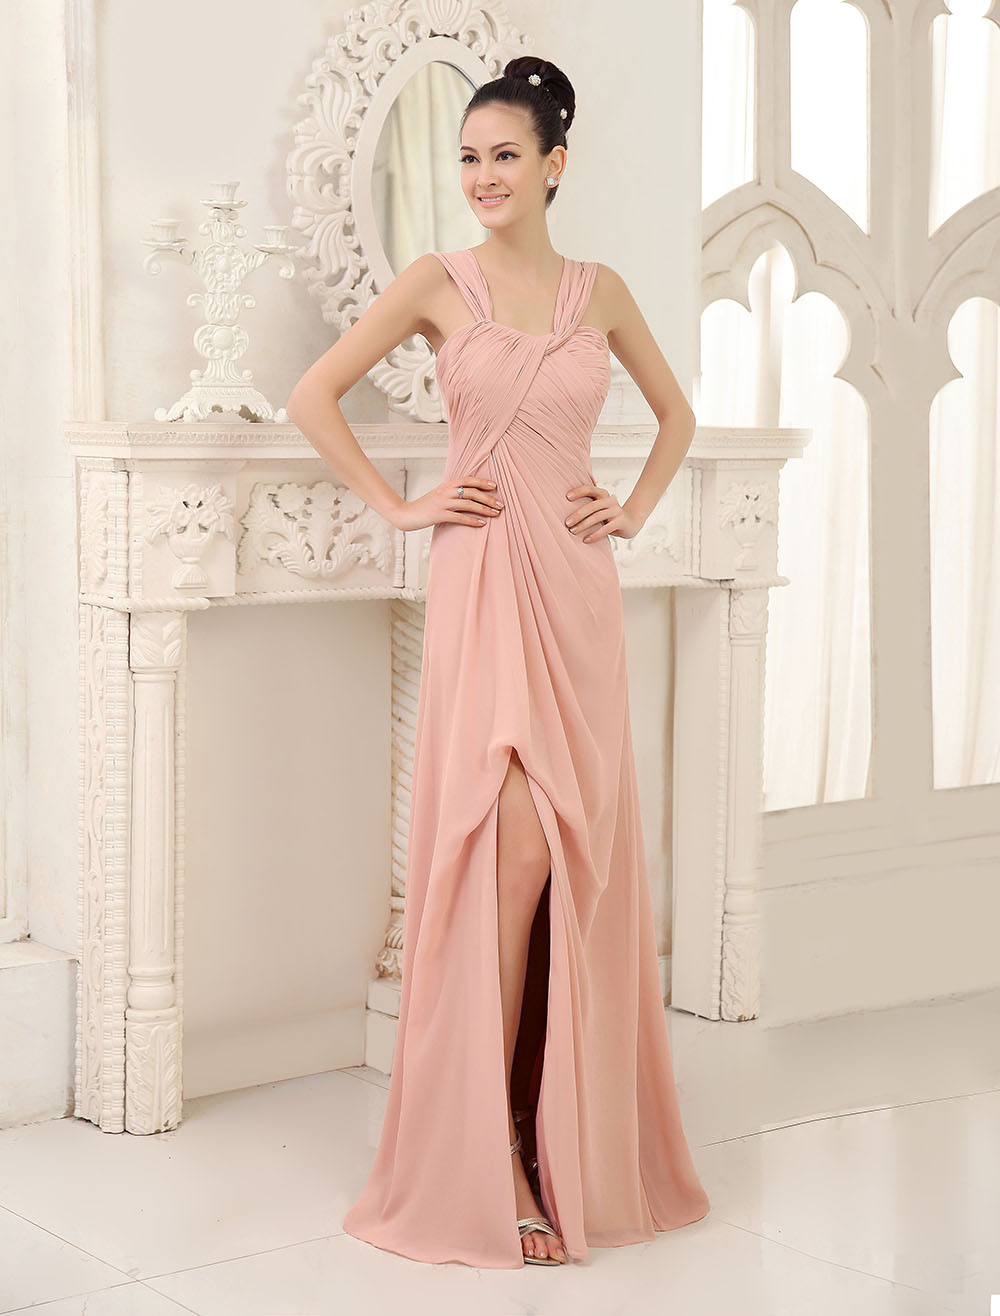 Blush Pink Bridesmaid Dress Long Sleeveless Chiffon Prom Dress High Split Pleated Straps Floor Length Wedding Party Dress